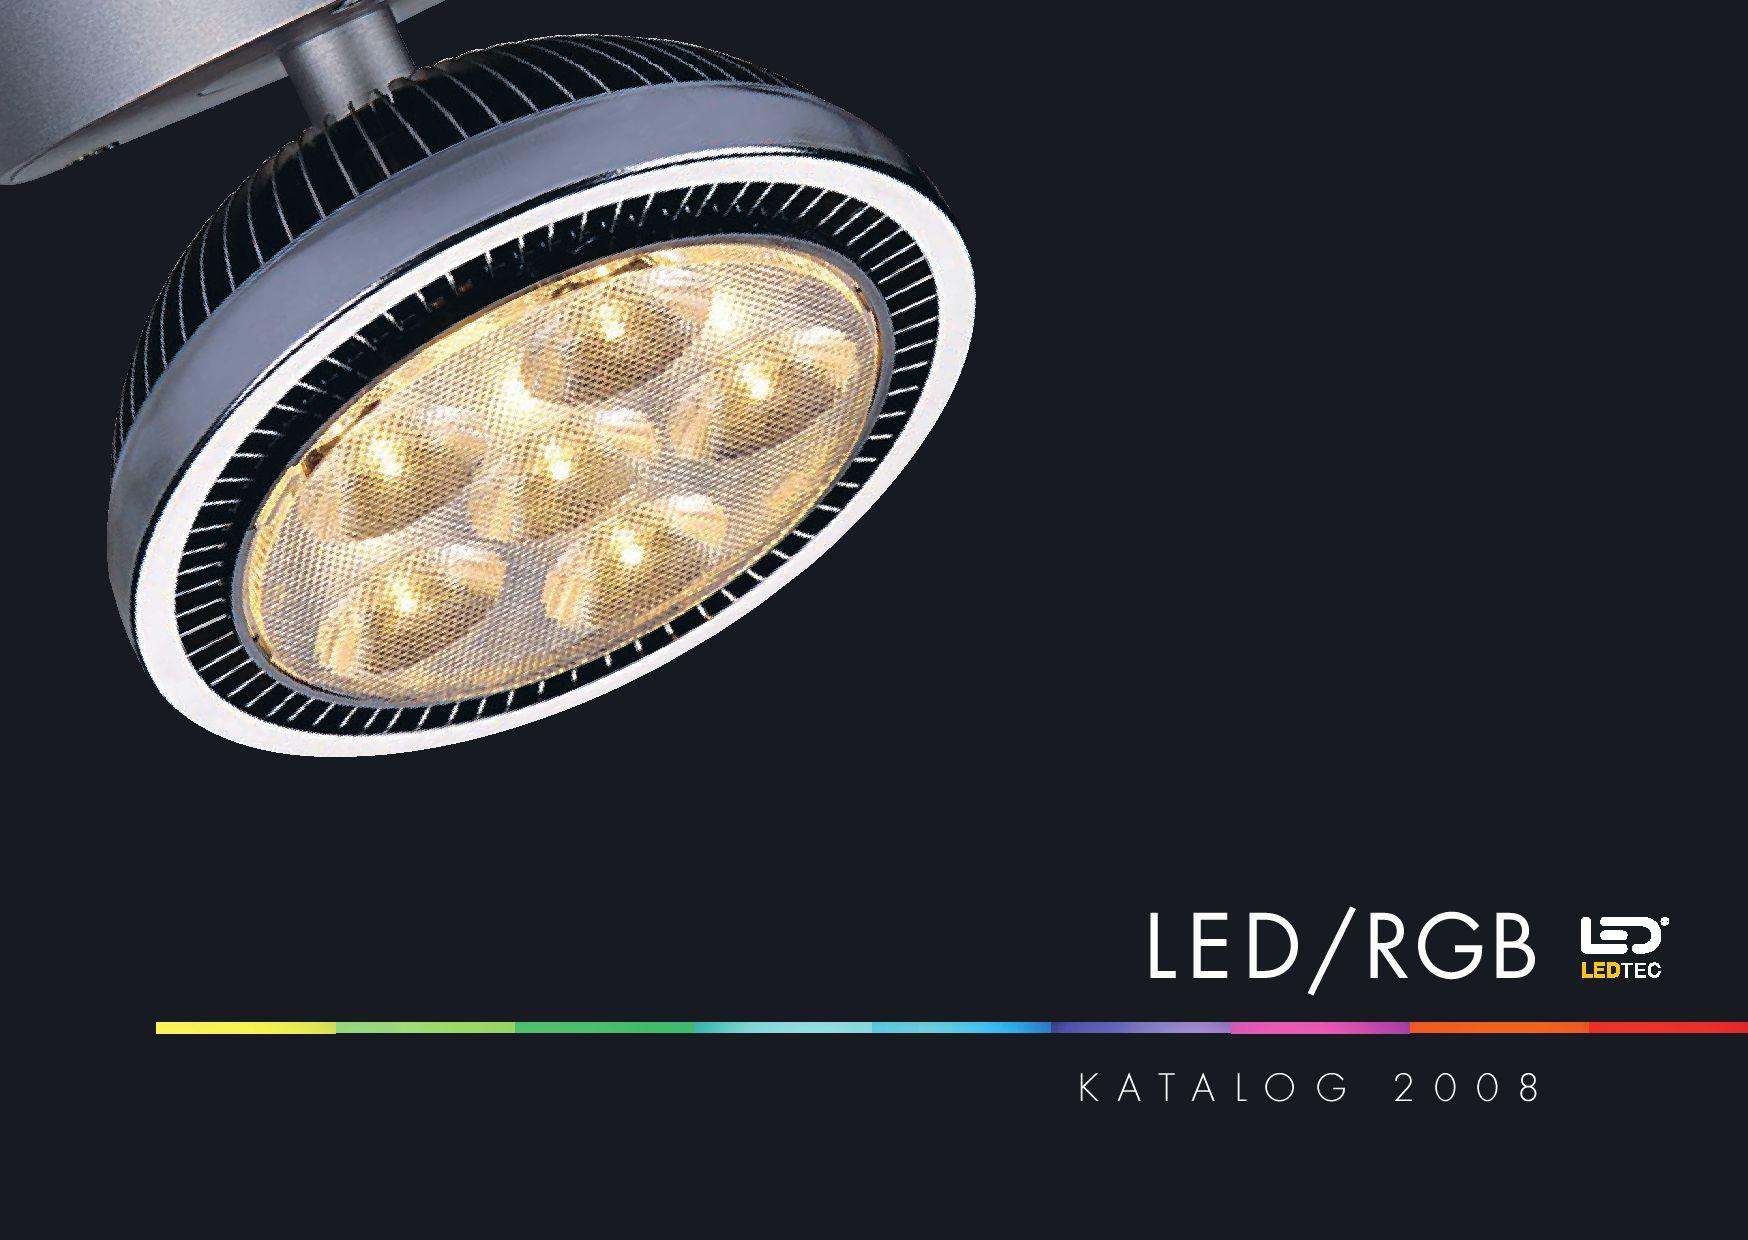 versch Kabel 18cm Mengen 12V LEDs verkabelt verlötet LED 3mm 12 Volt Weiß